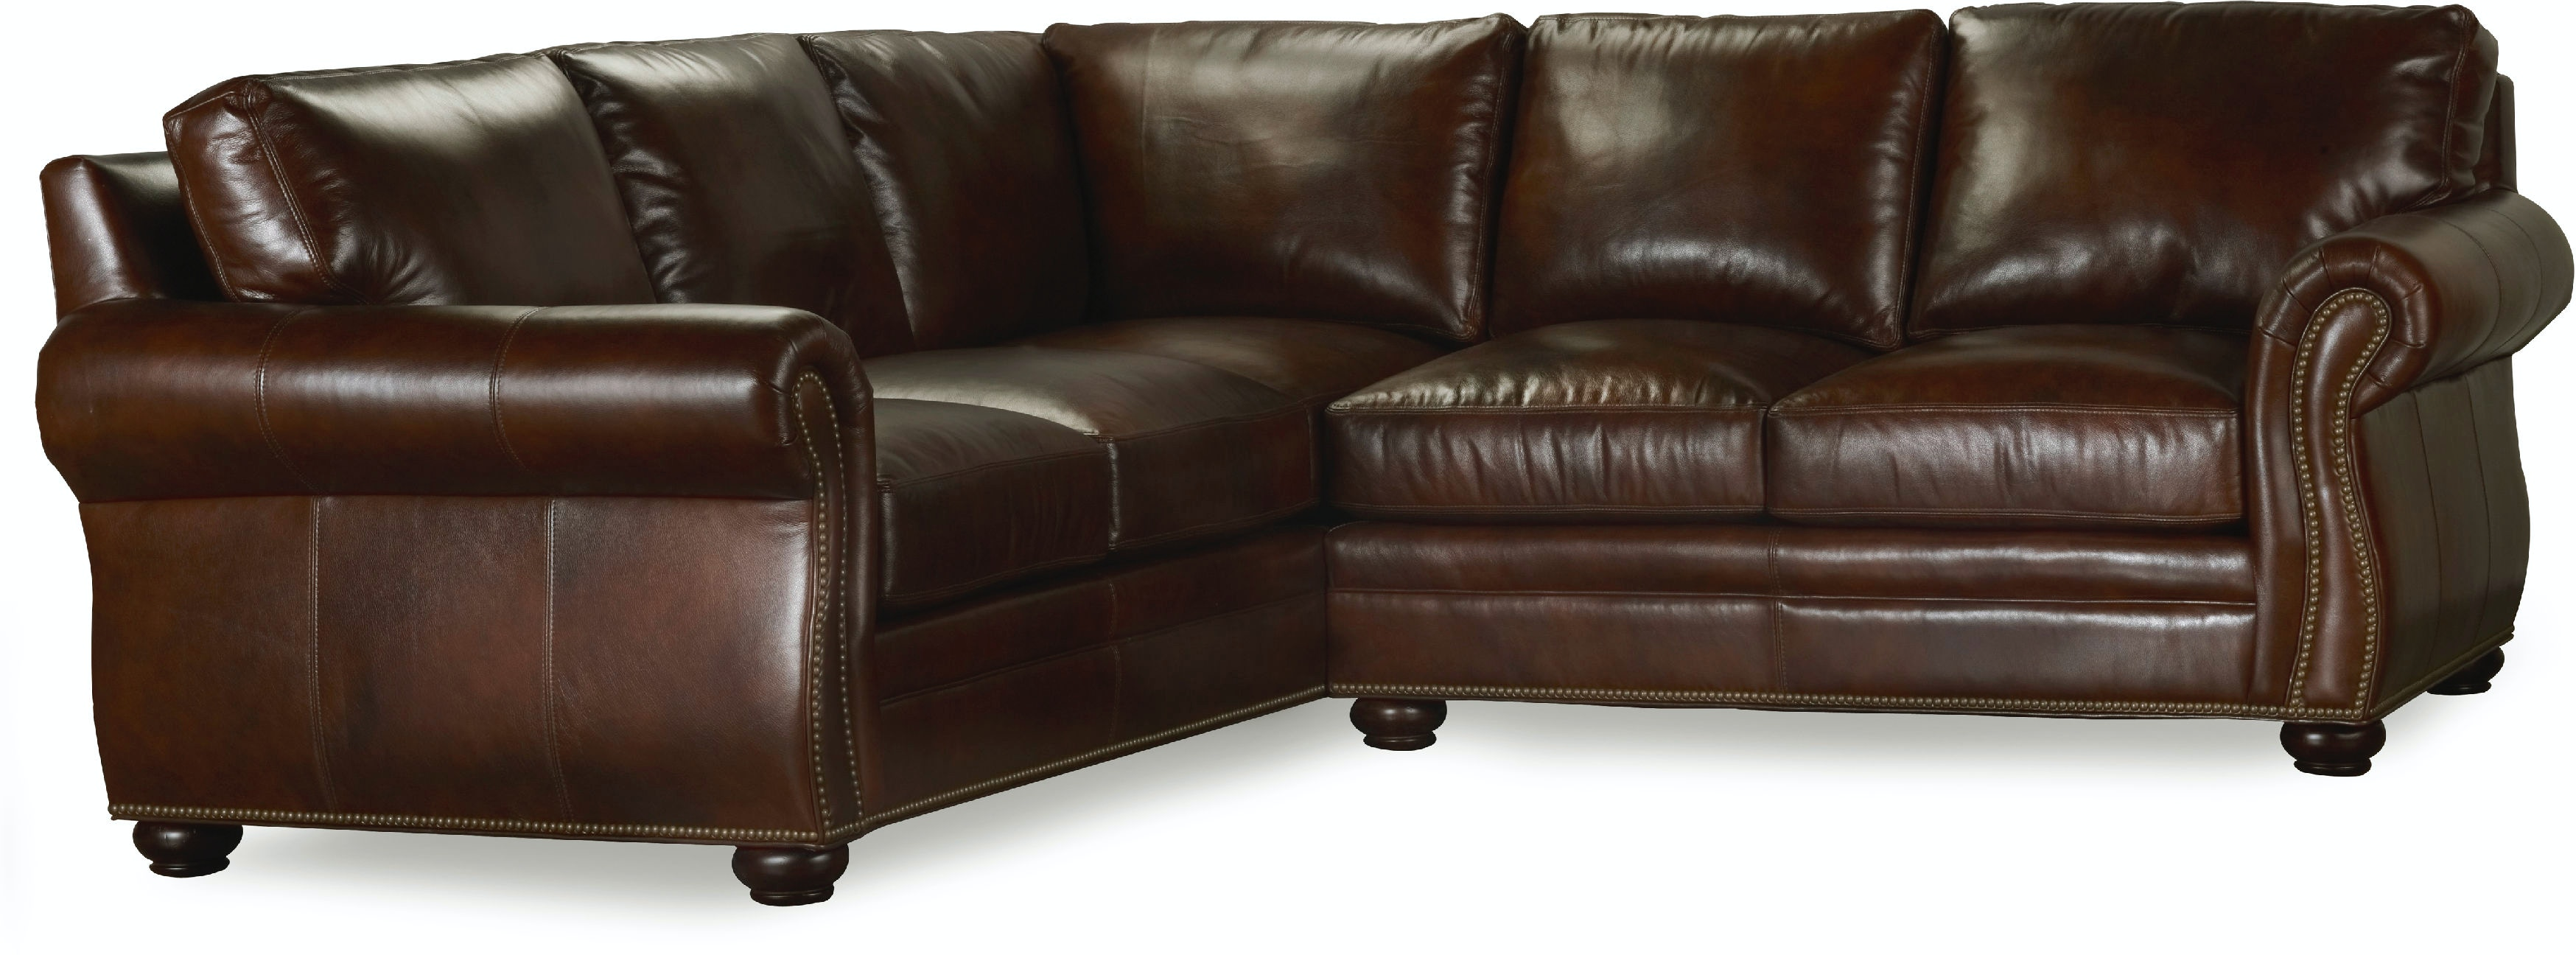 Bradington Young Furniture 221 58 Living Room Sterling Raf